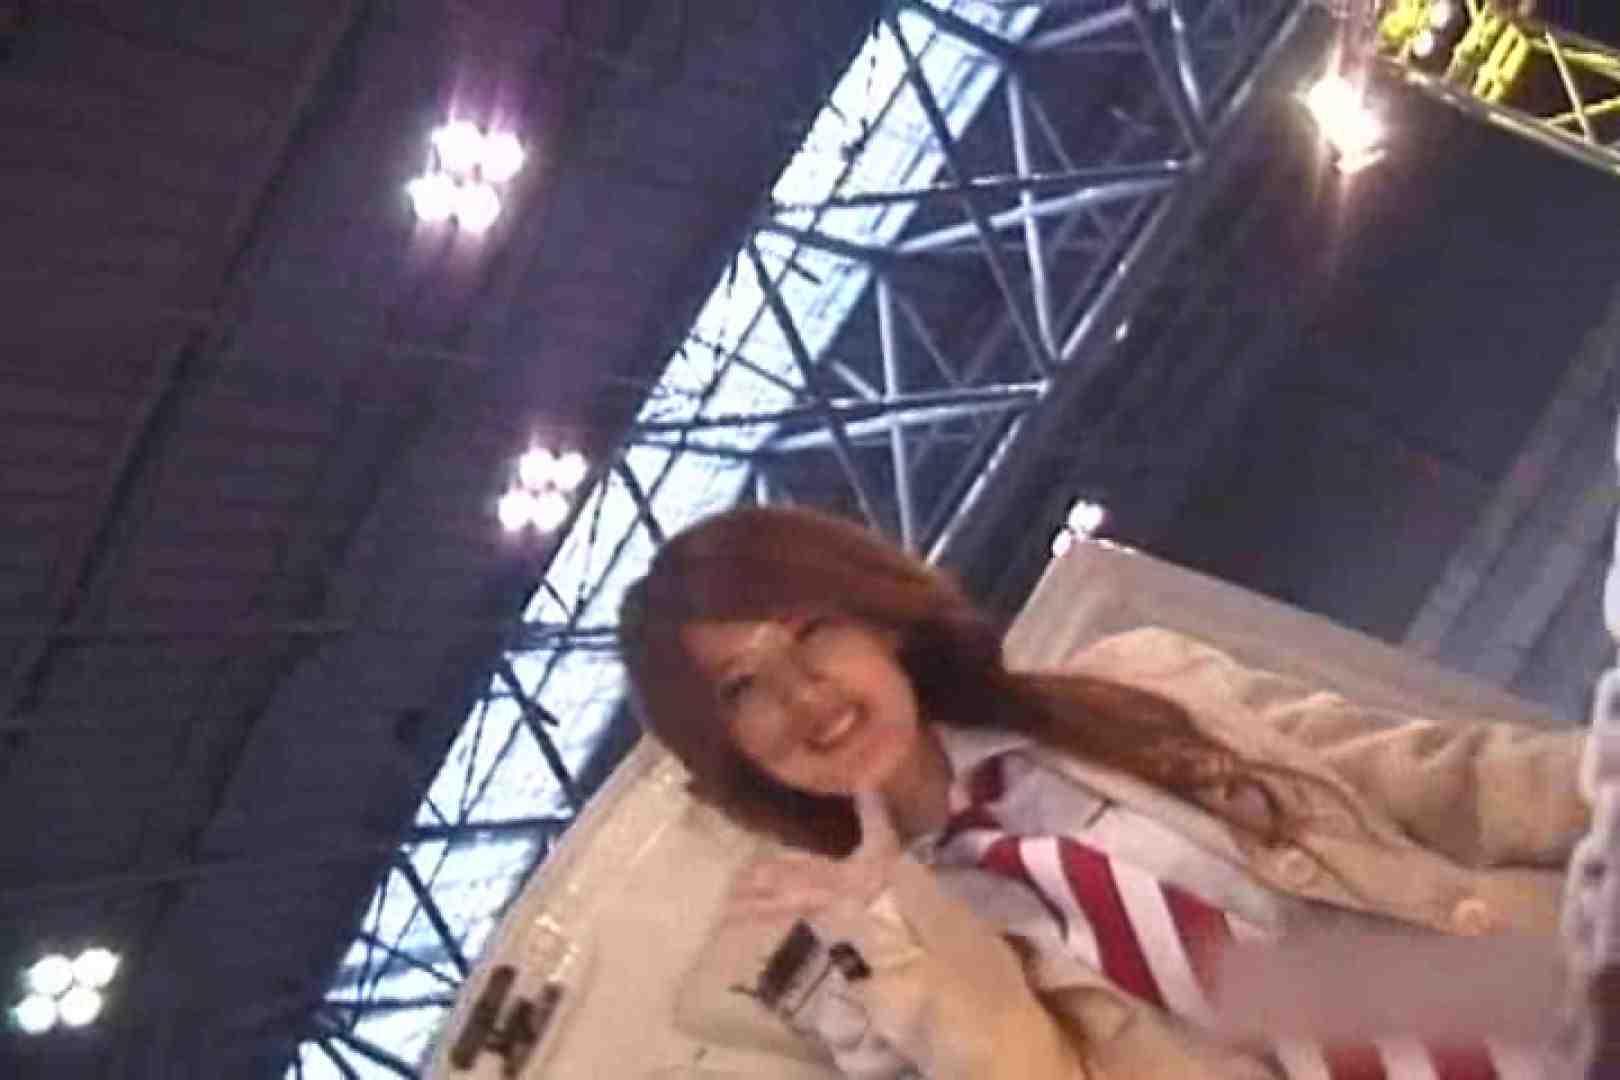 RQカメラ地獄Vol.27 美女 スケベ動画紹介 69連発 11